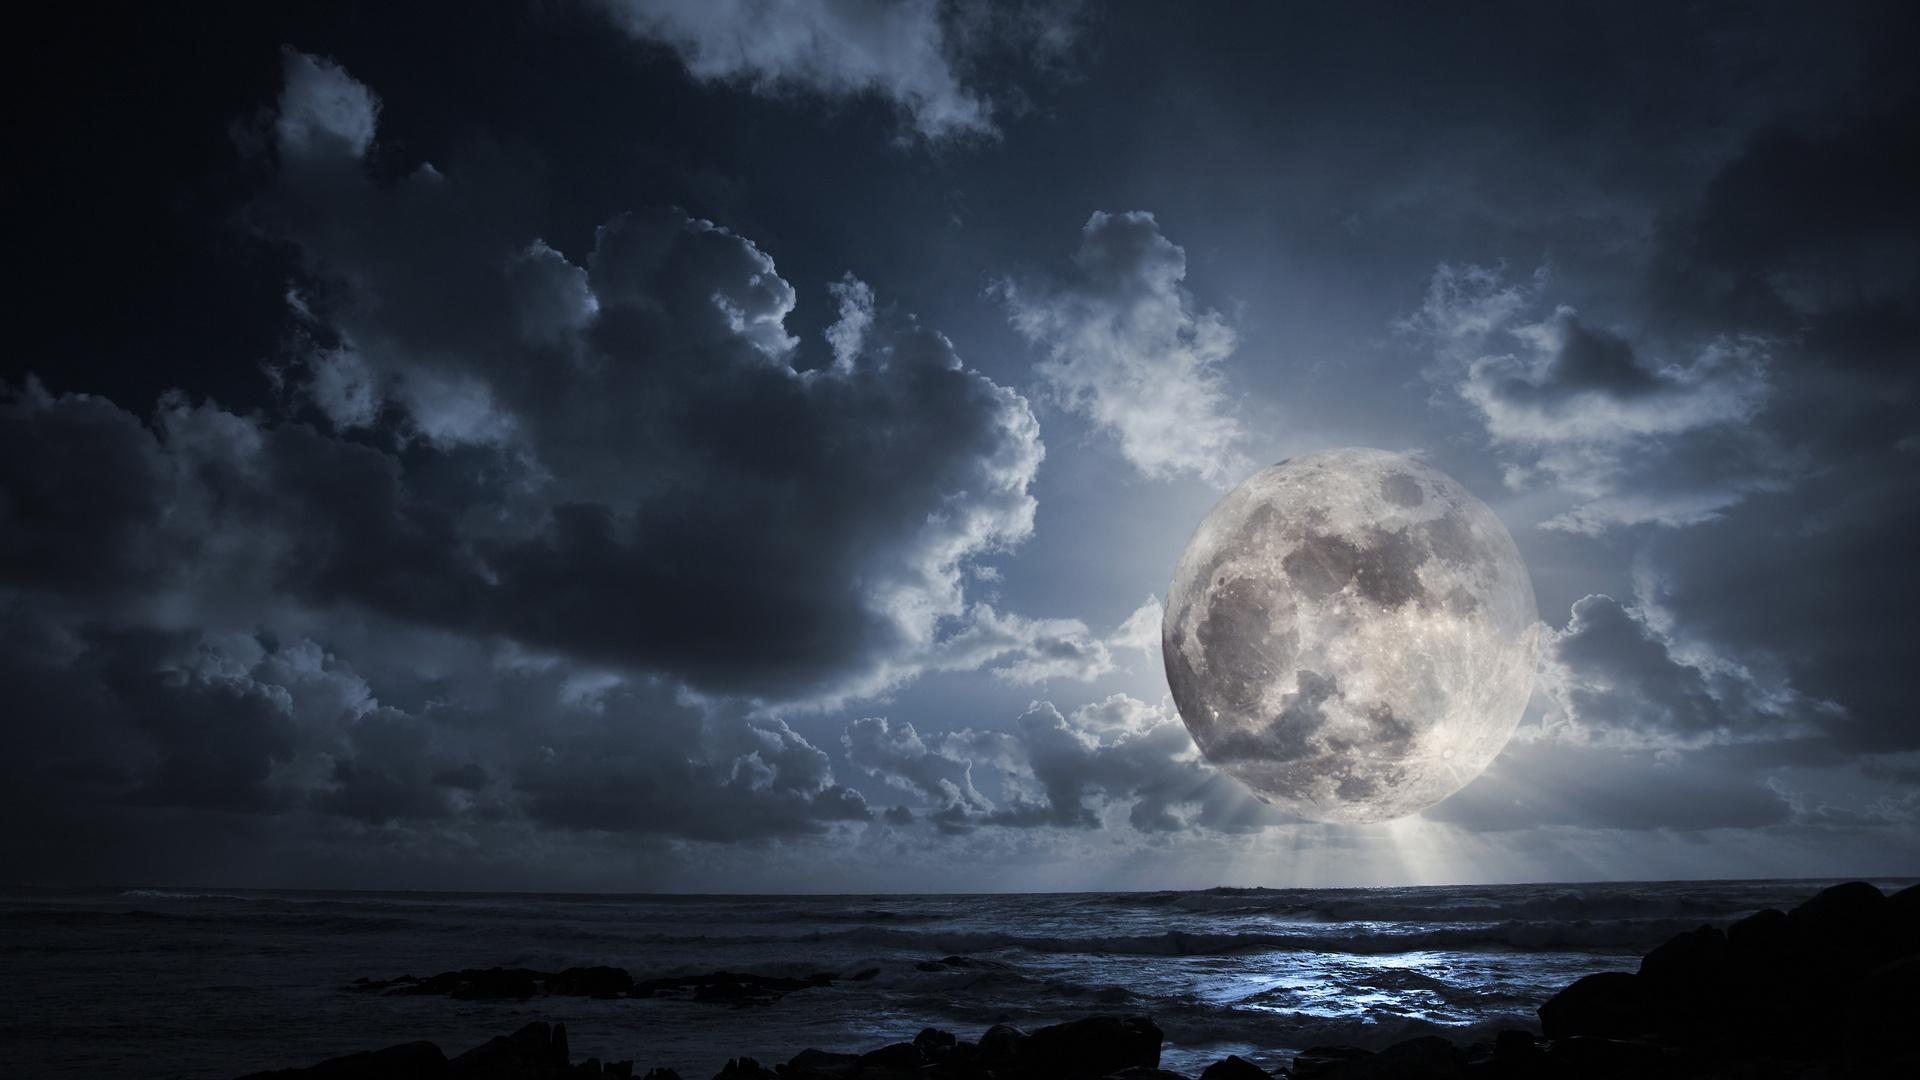 картинки ночь полнолуние срокився